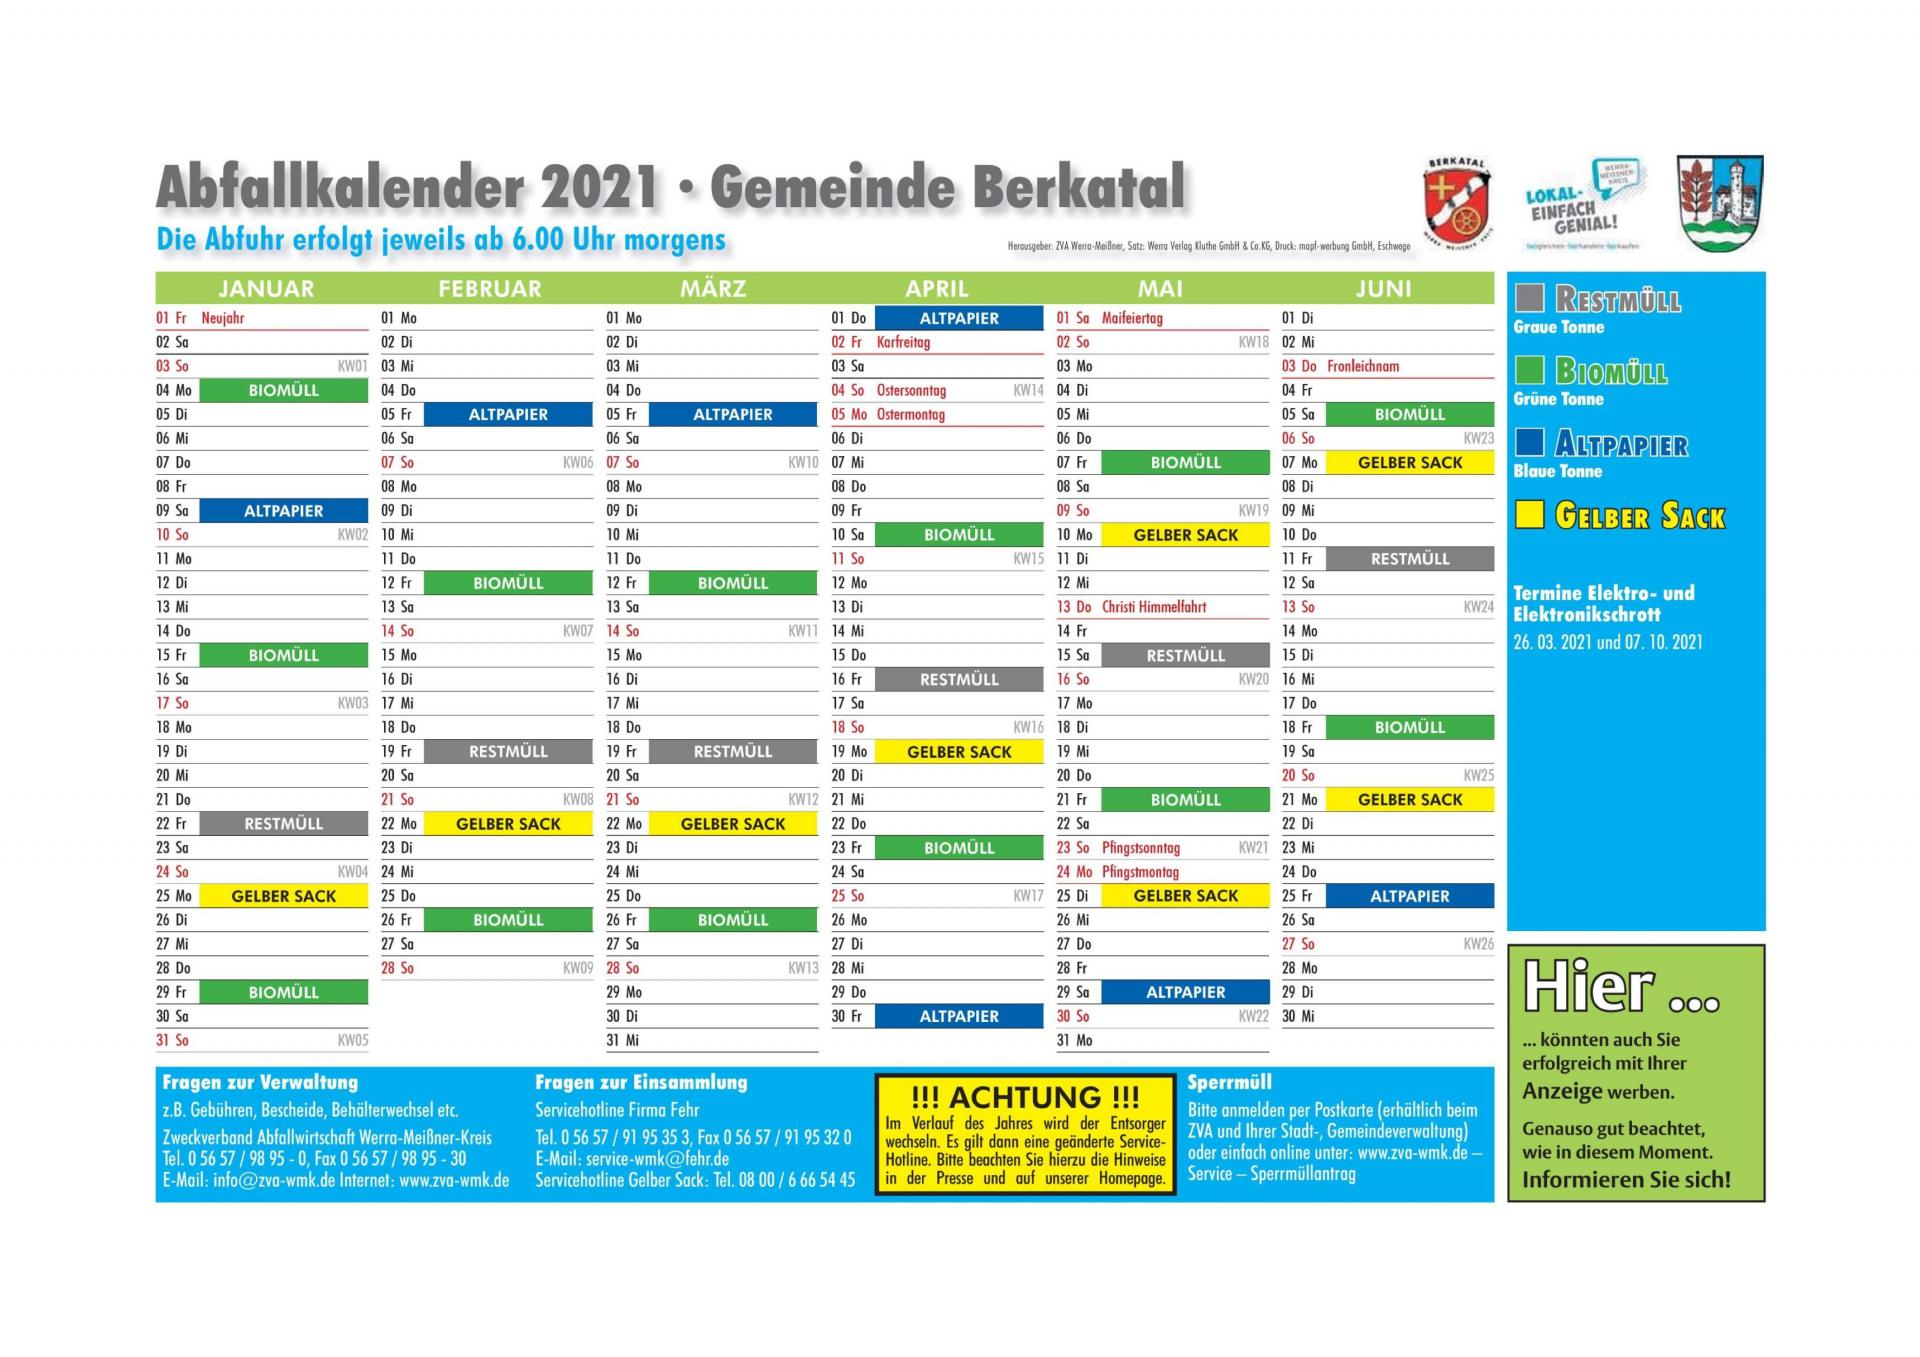 Abfallkalender 2021 1. HJ